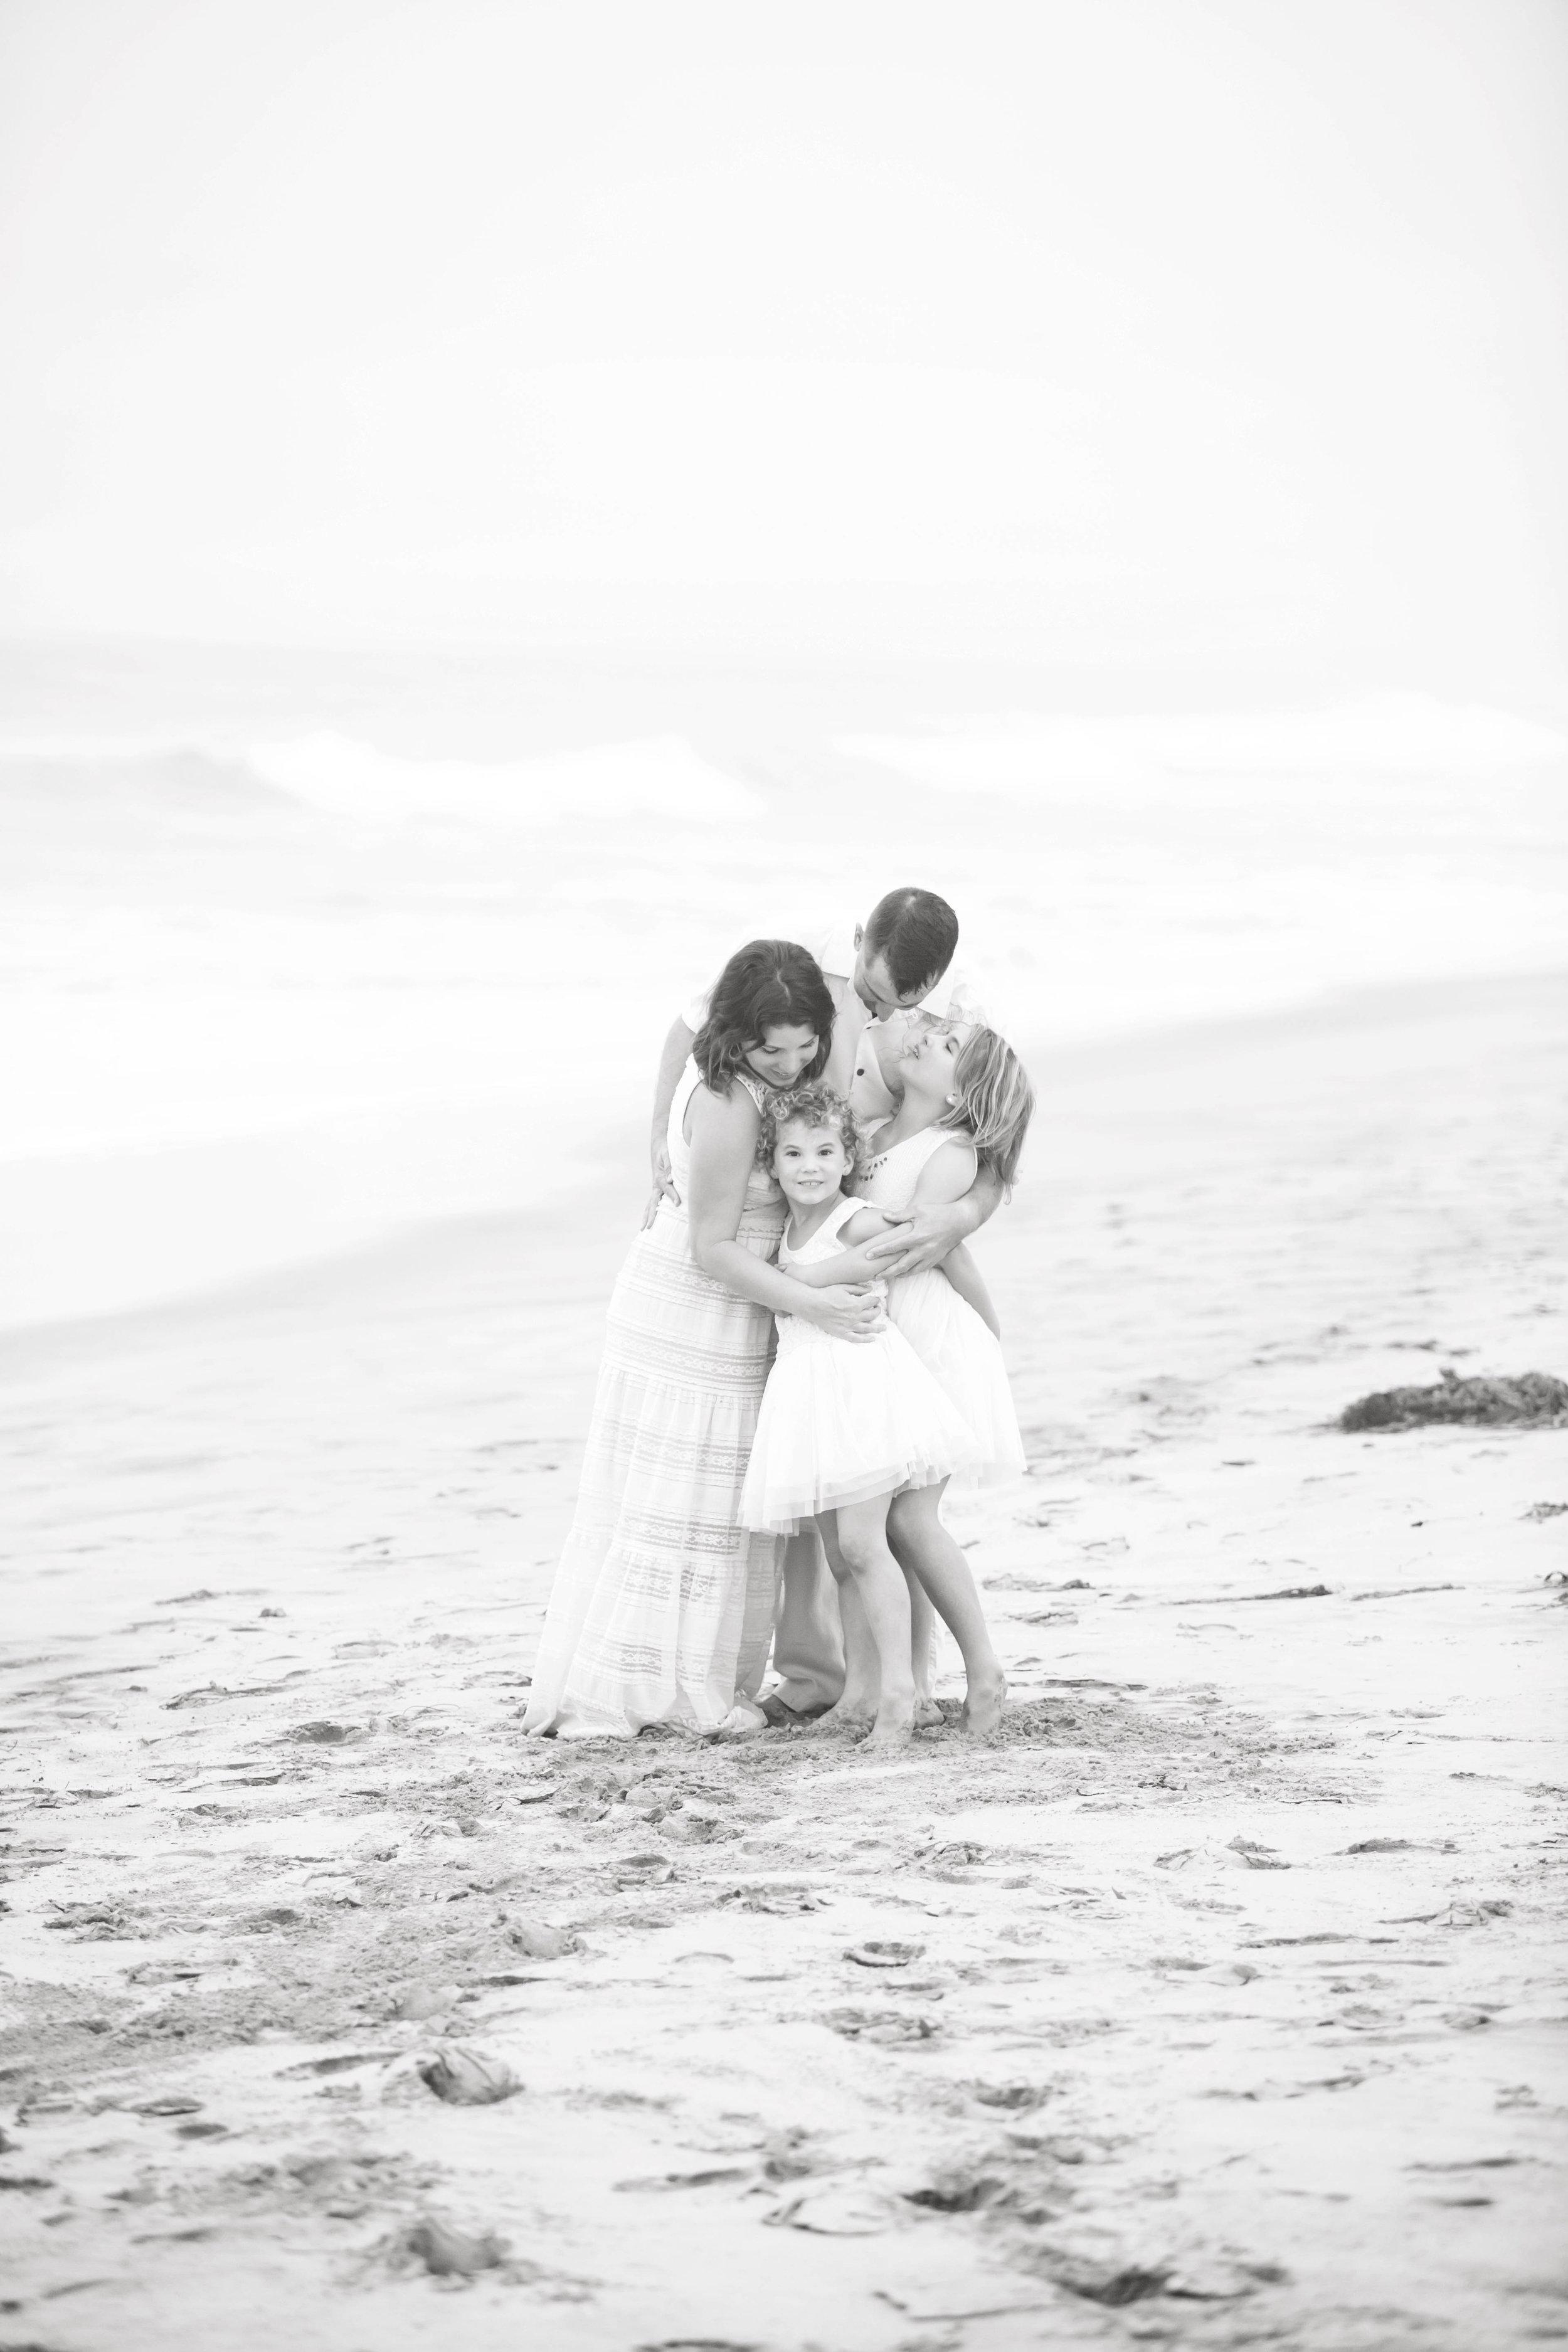 Marble_Falls_Family_Photographer_Jenna_Petty_10.jpg